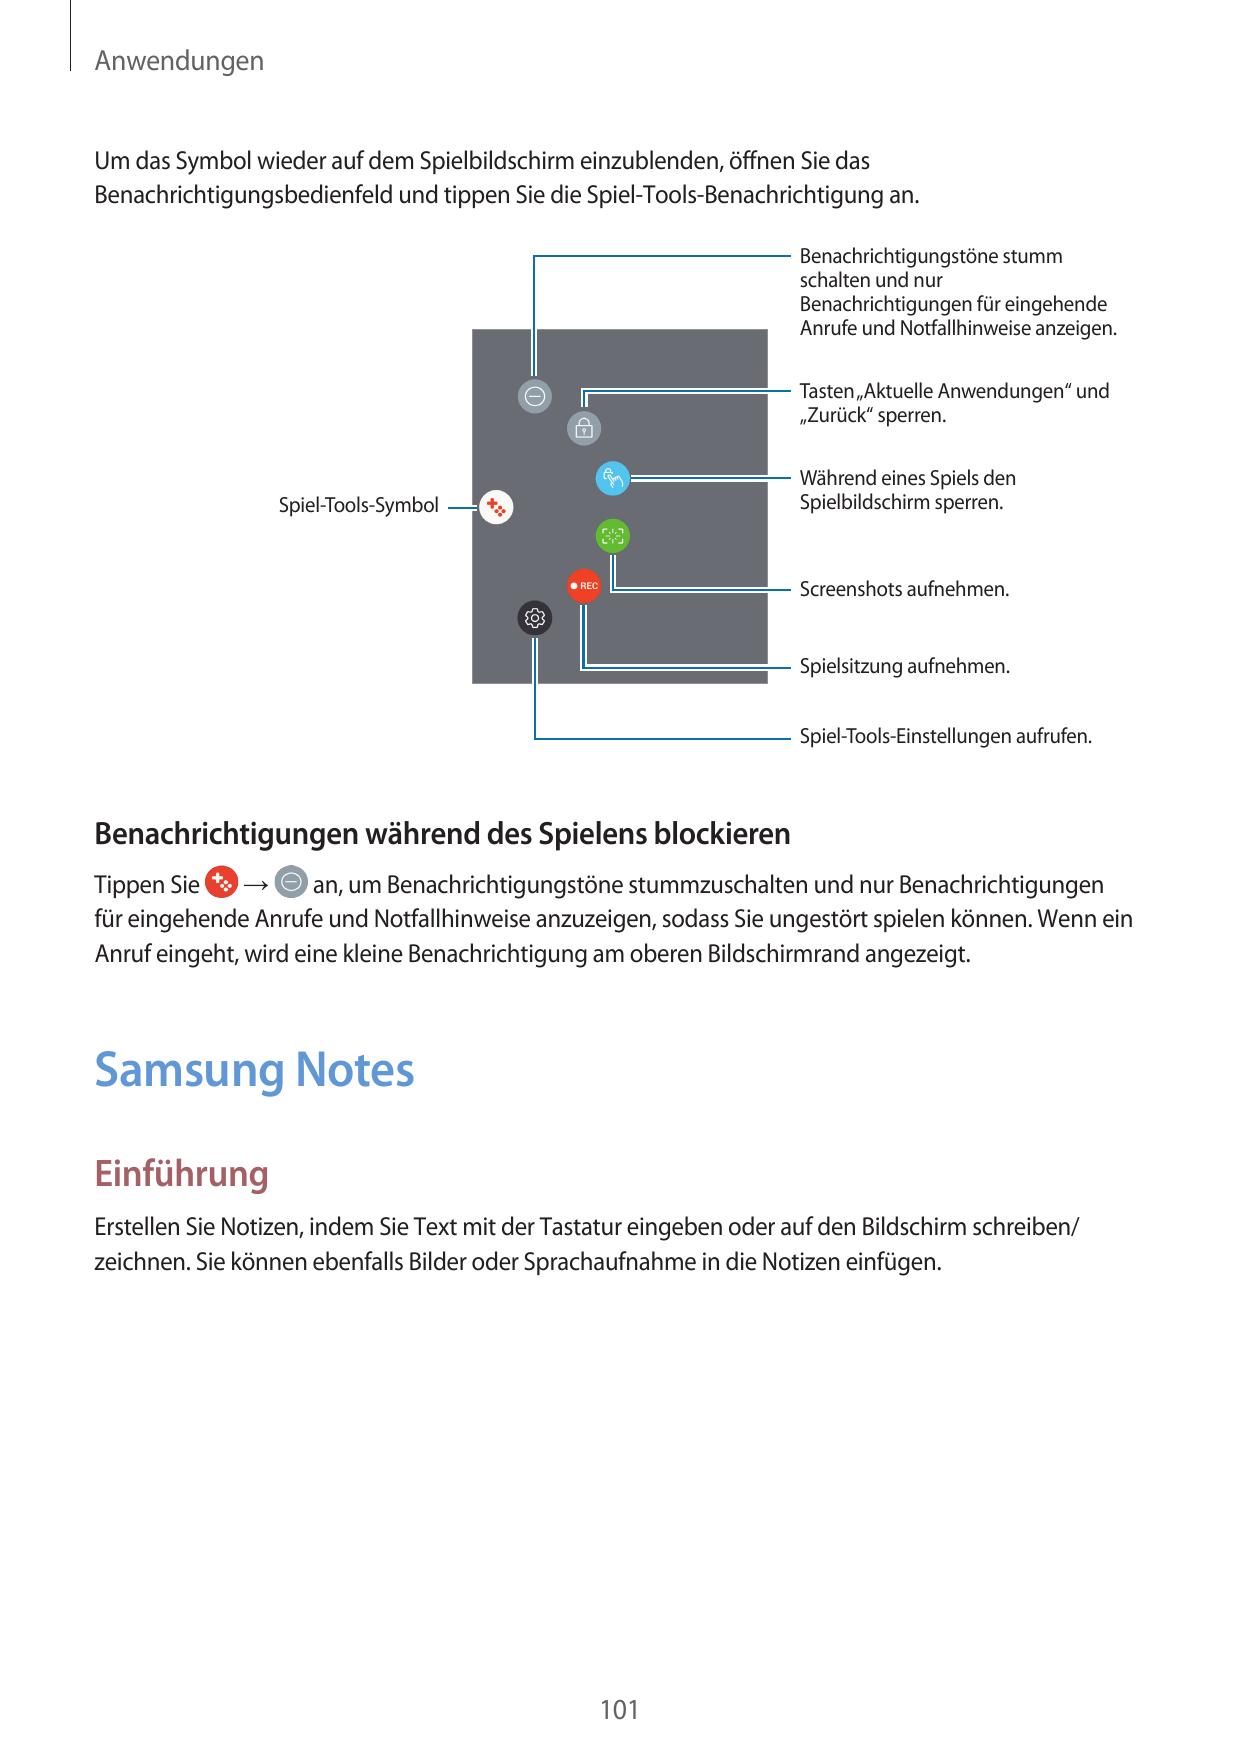 Bedienungsanleitung - Samsung Galaxy A5 (2017) - Android 6.0 ...